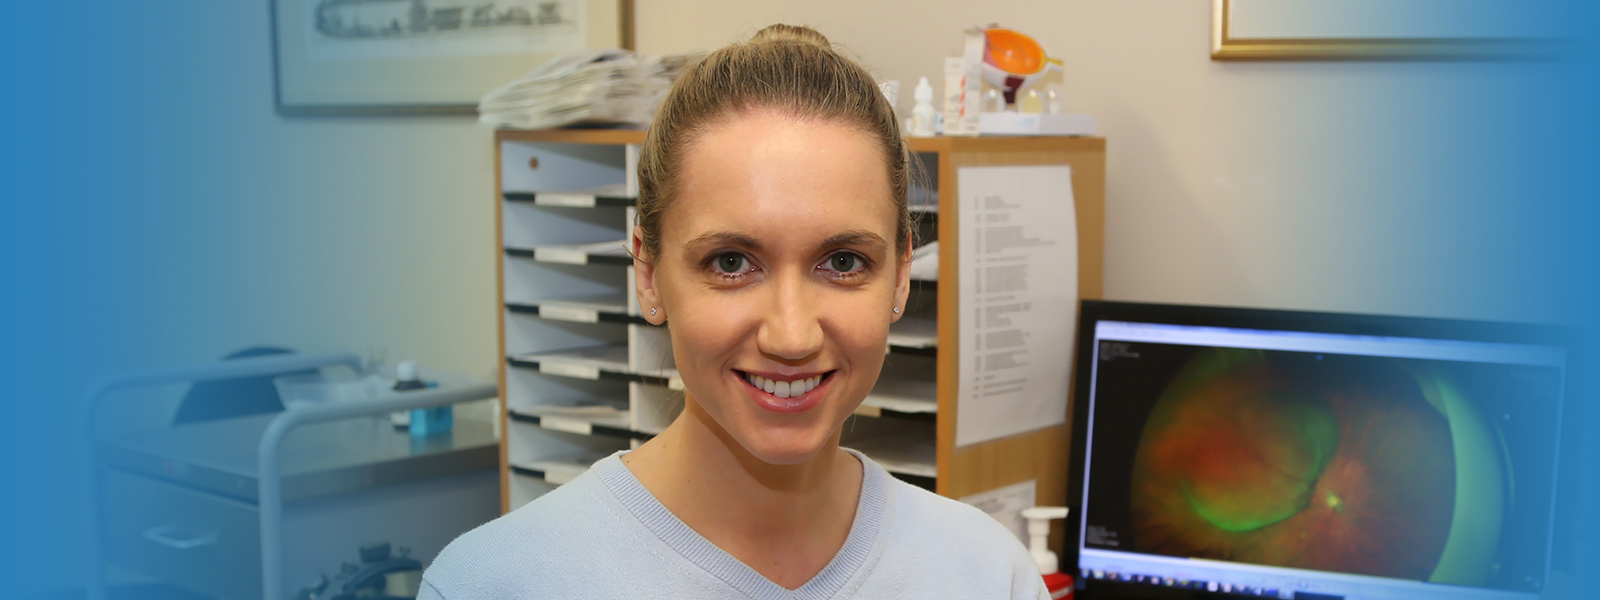 Dr. Charlotte McKnight